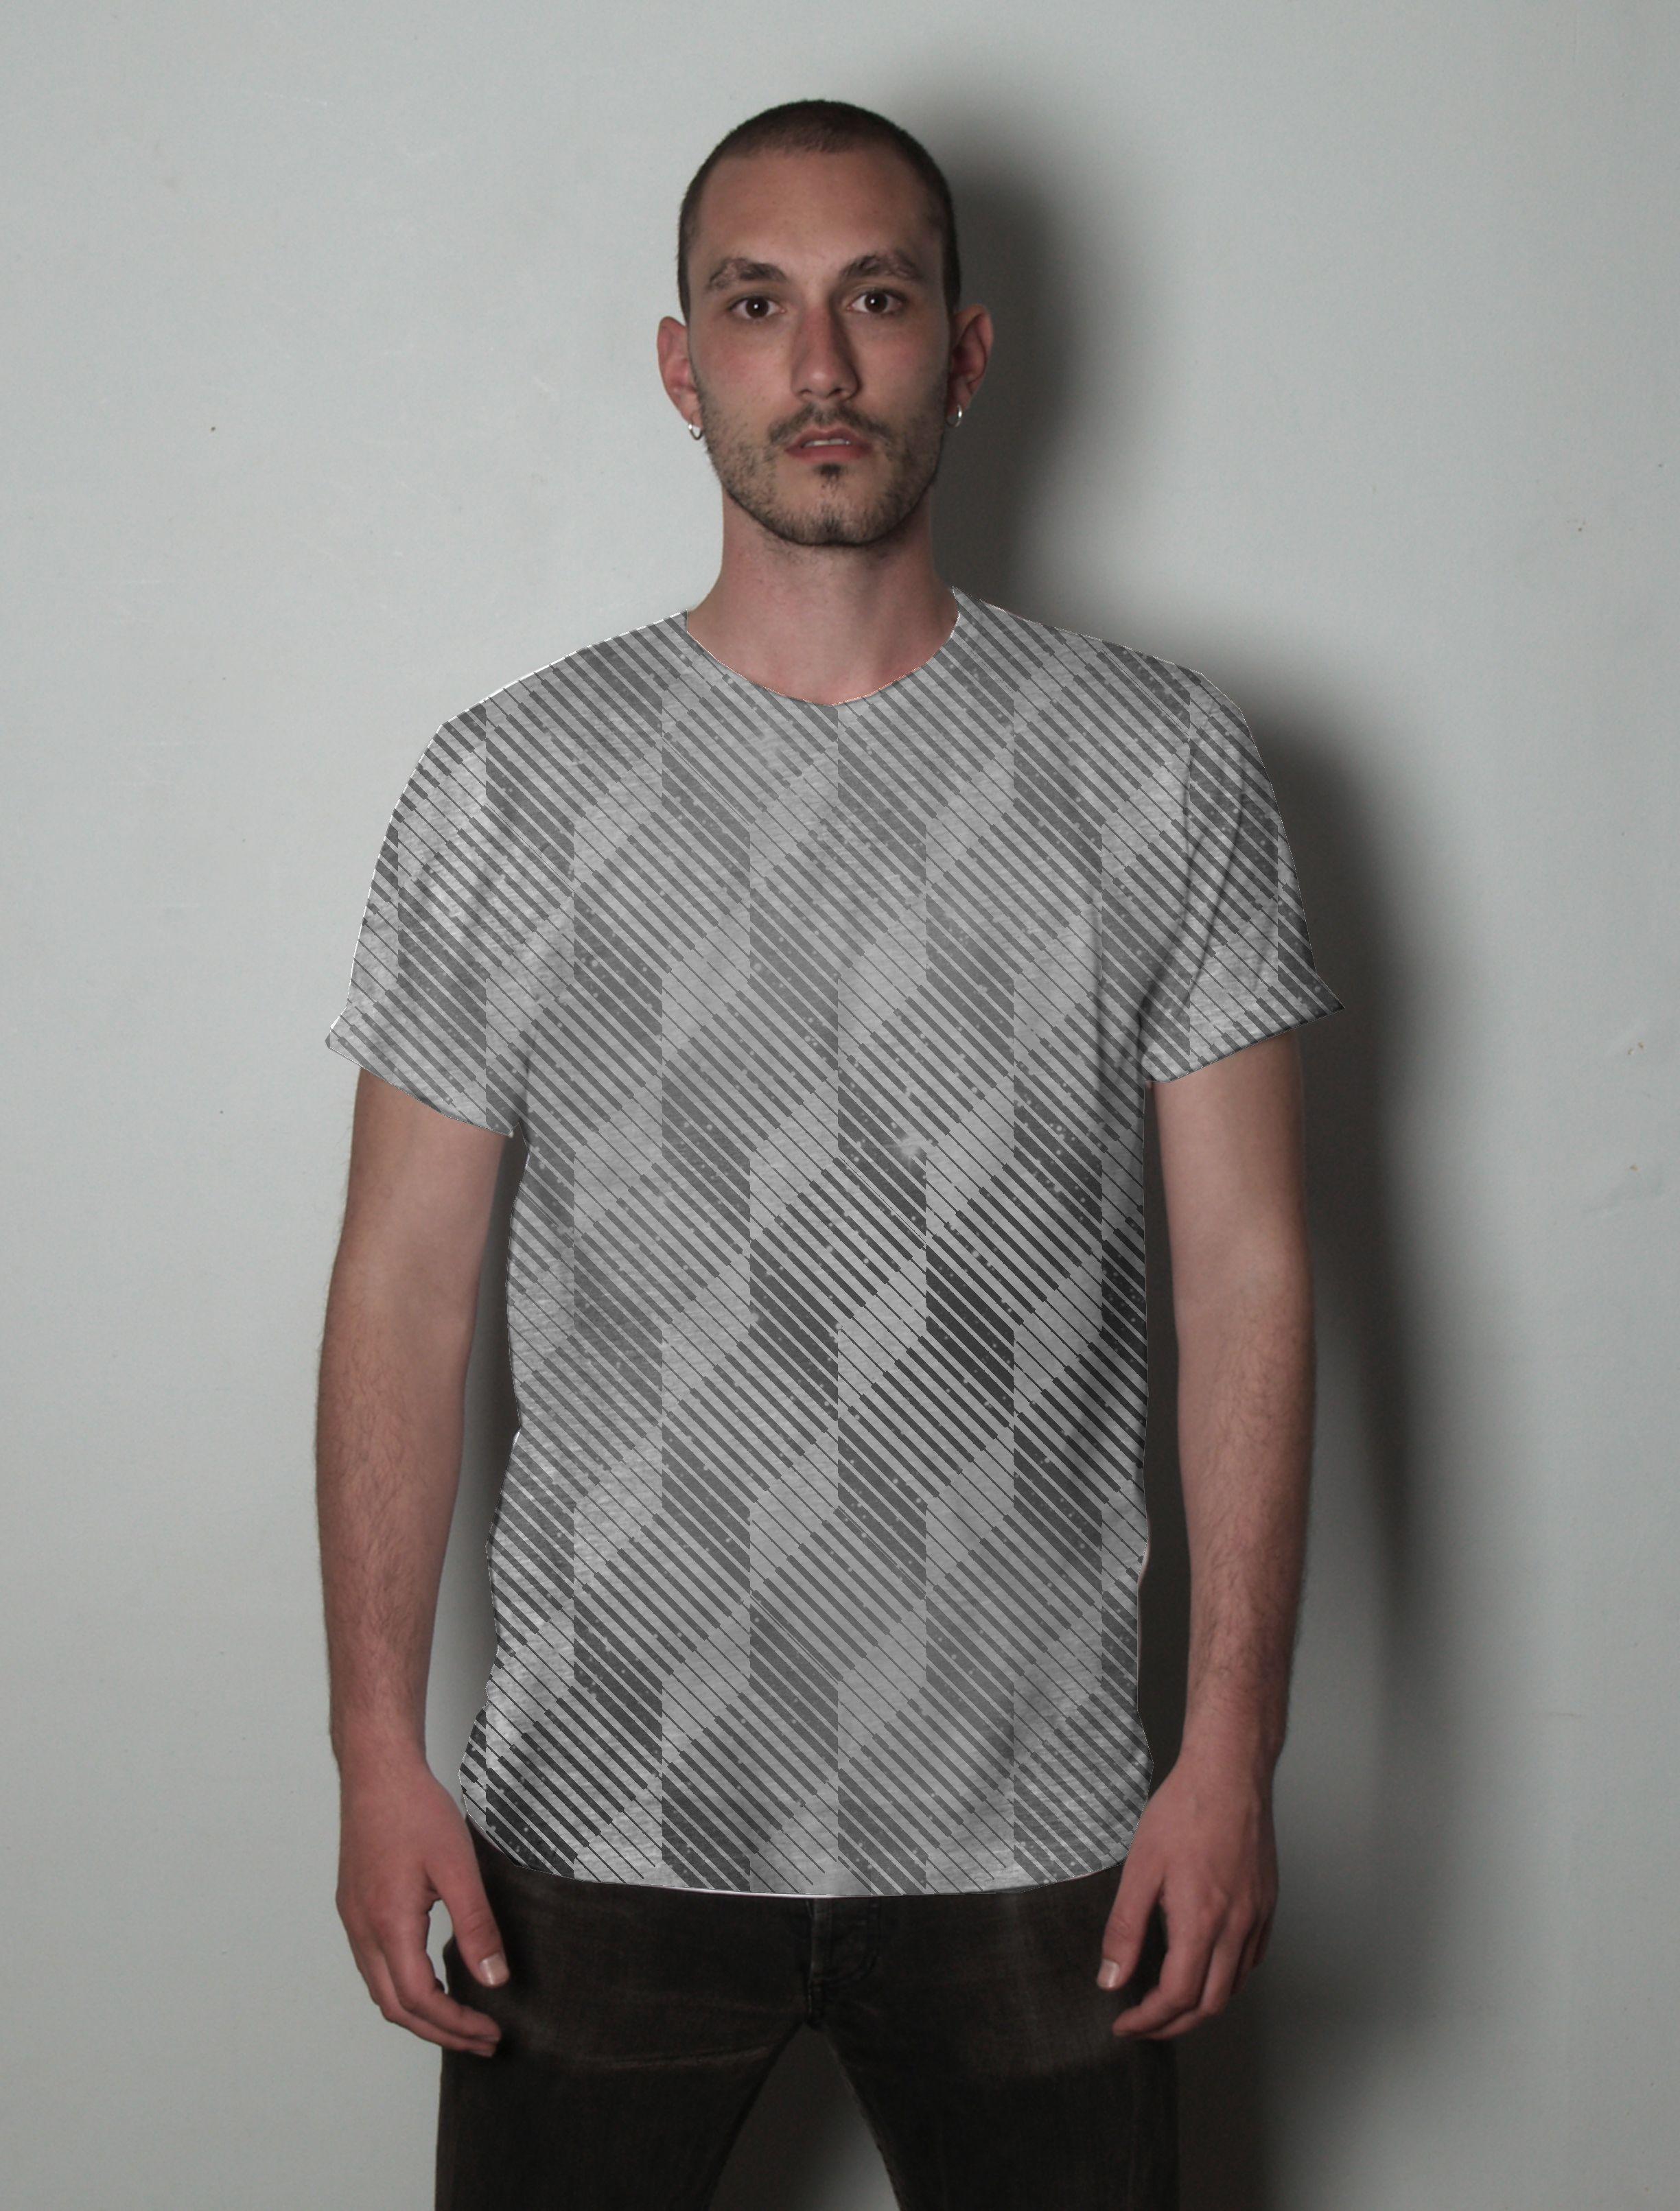 T Shirt Design Ideas Pinterest 25 creative and brilliant t shirt design ideas for your inspiration follow us www Diamond Raw Logo T Shirt Design Idea